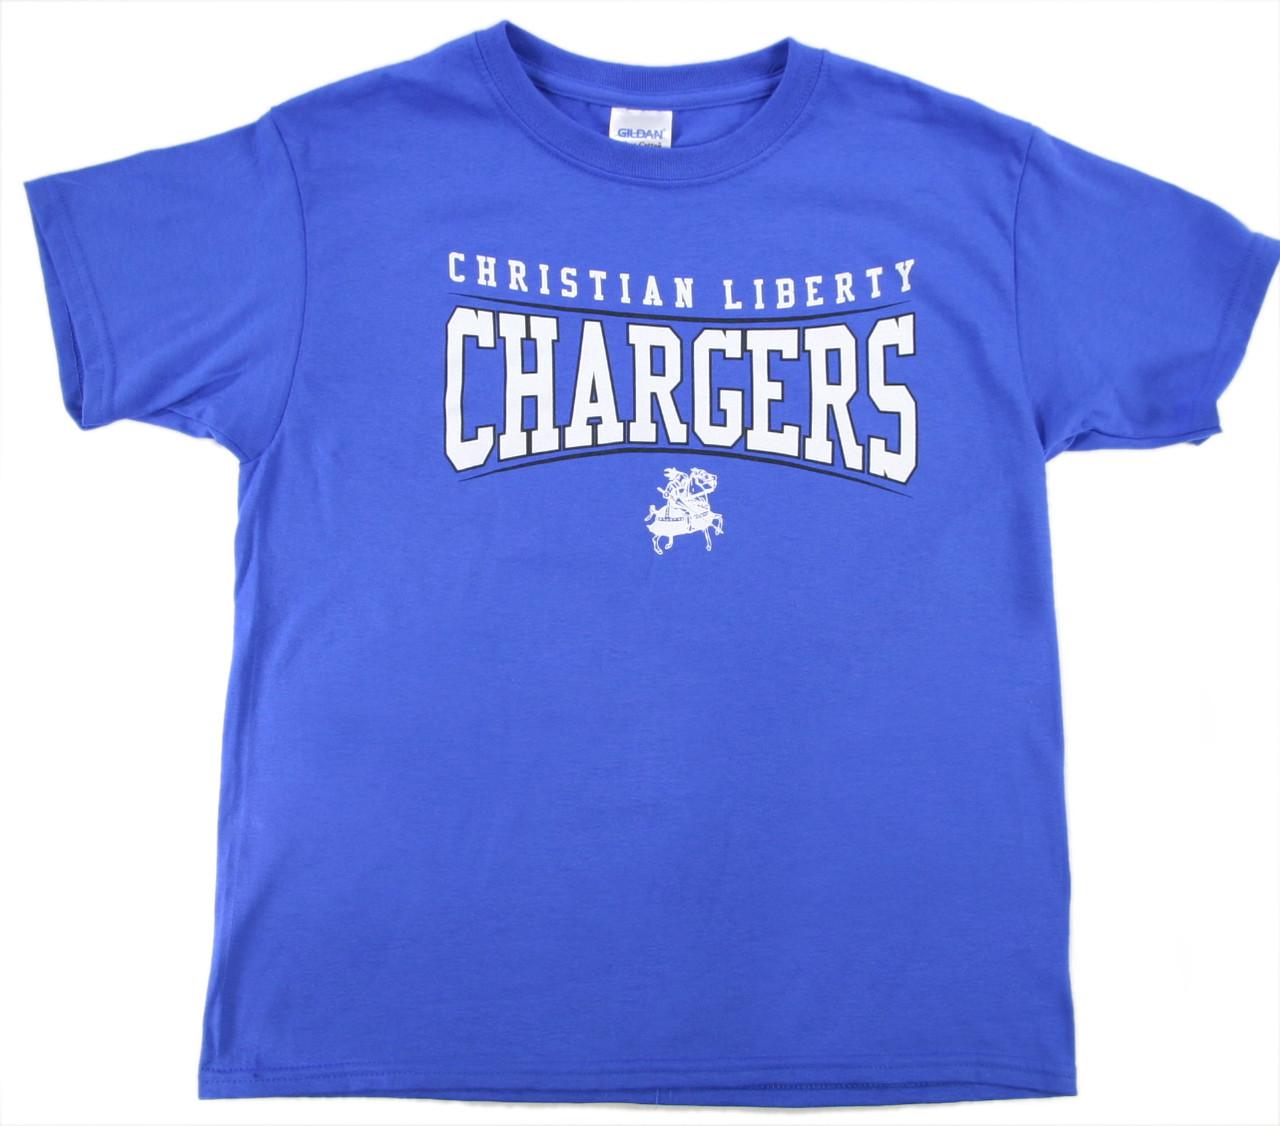 Blue Adult T-shirt